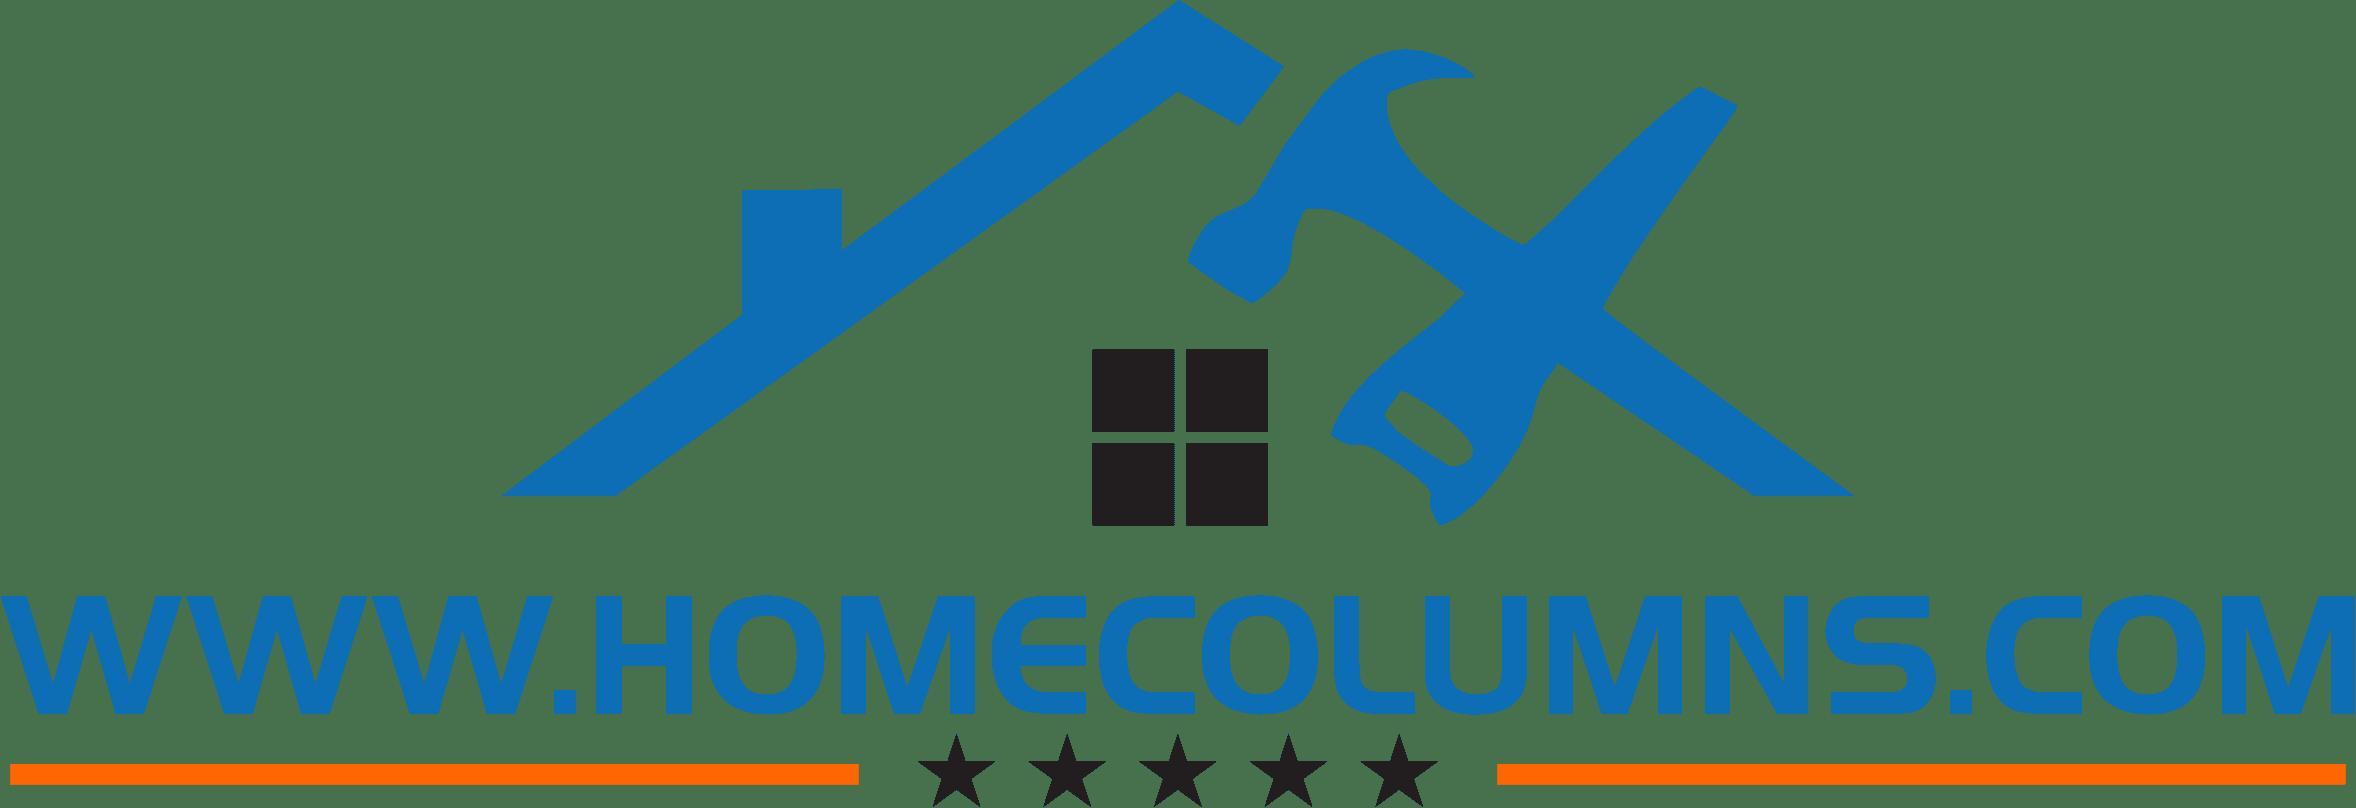 www.homecolumns.com Logo